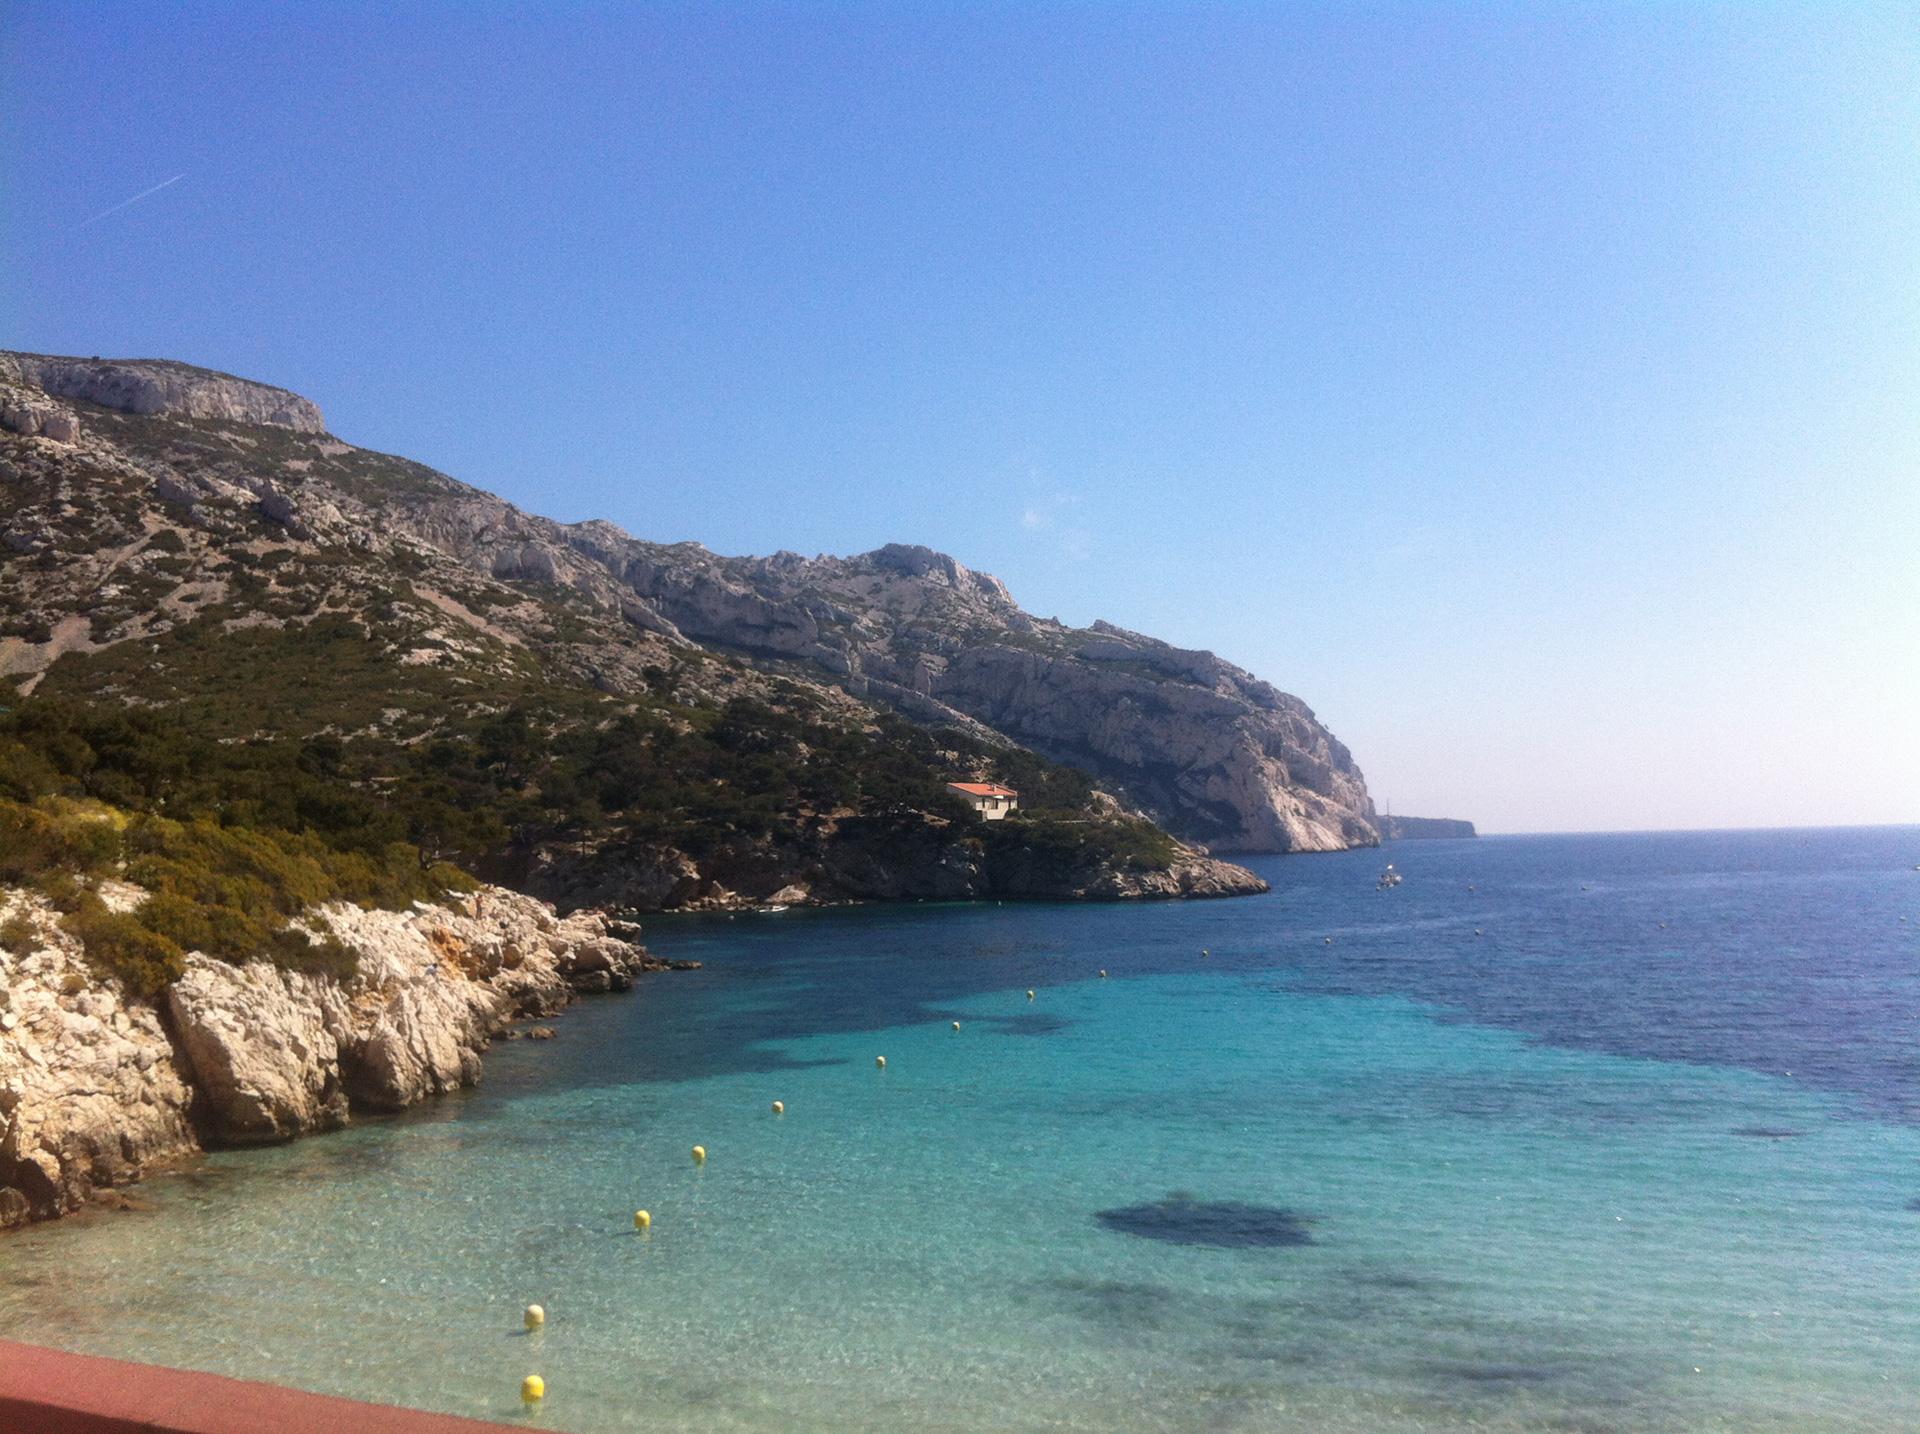 Calanque de Sormiou Calanc'o Kayak Paddle Marseille